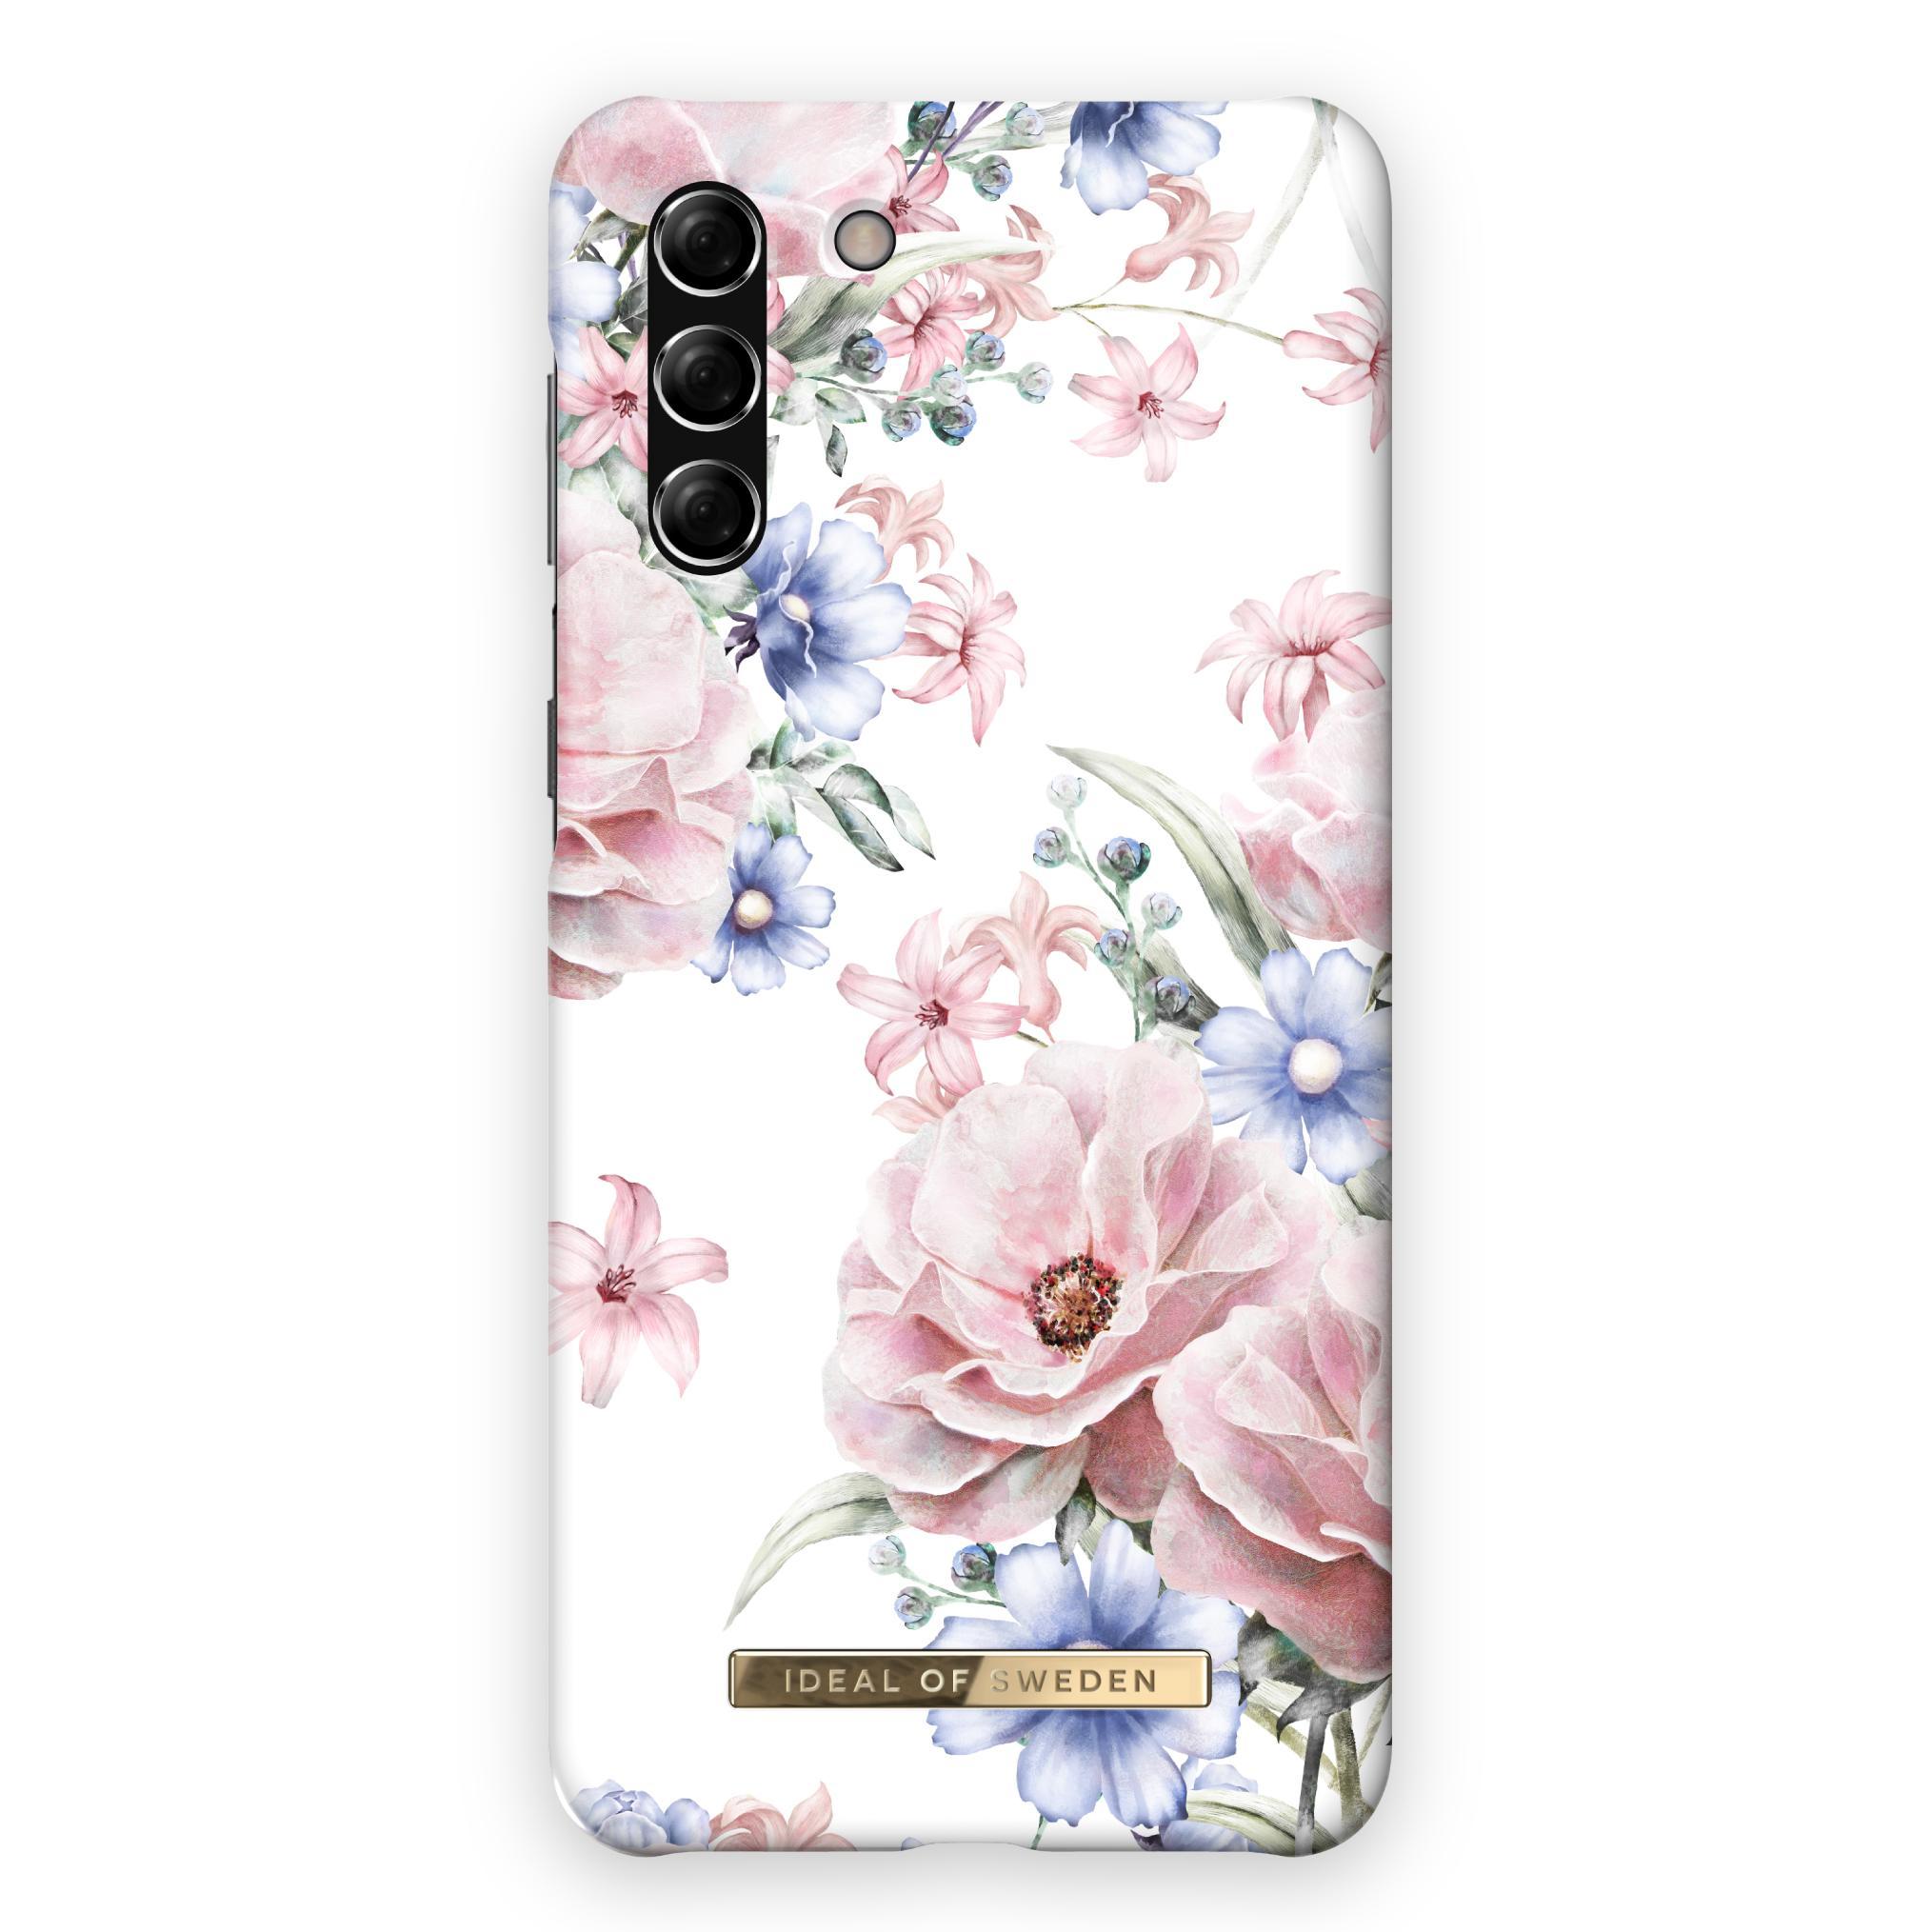 Fashion Case Galaxy S21 Floral Romance